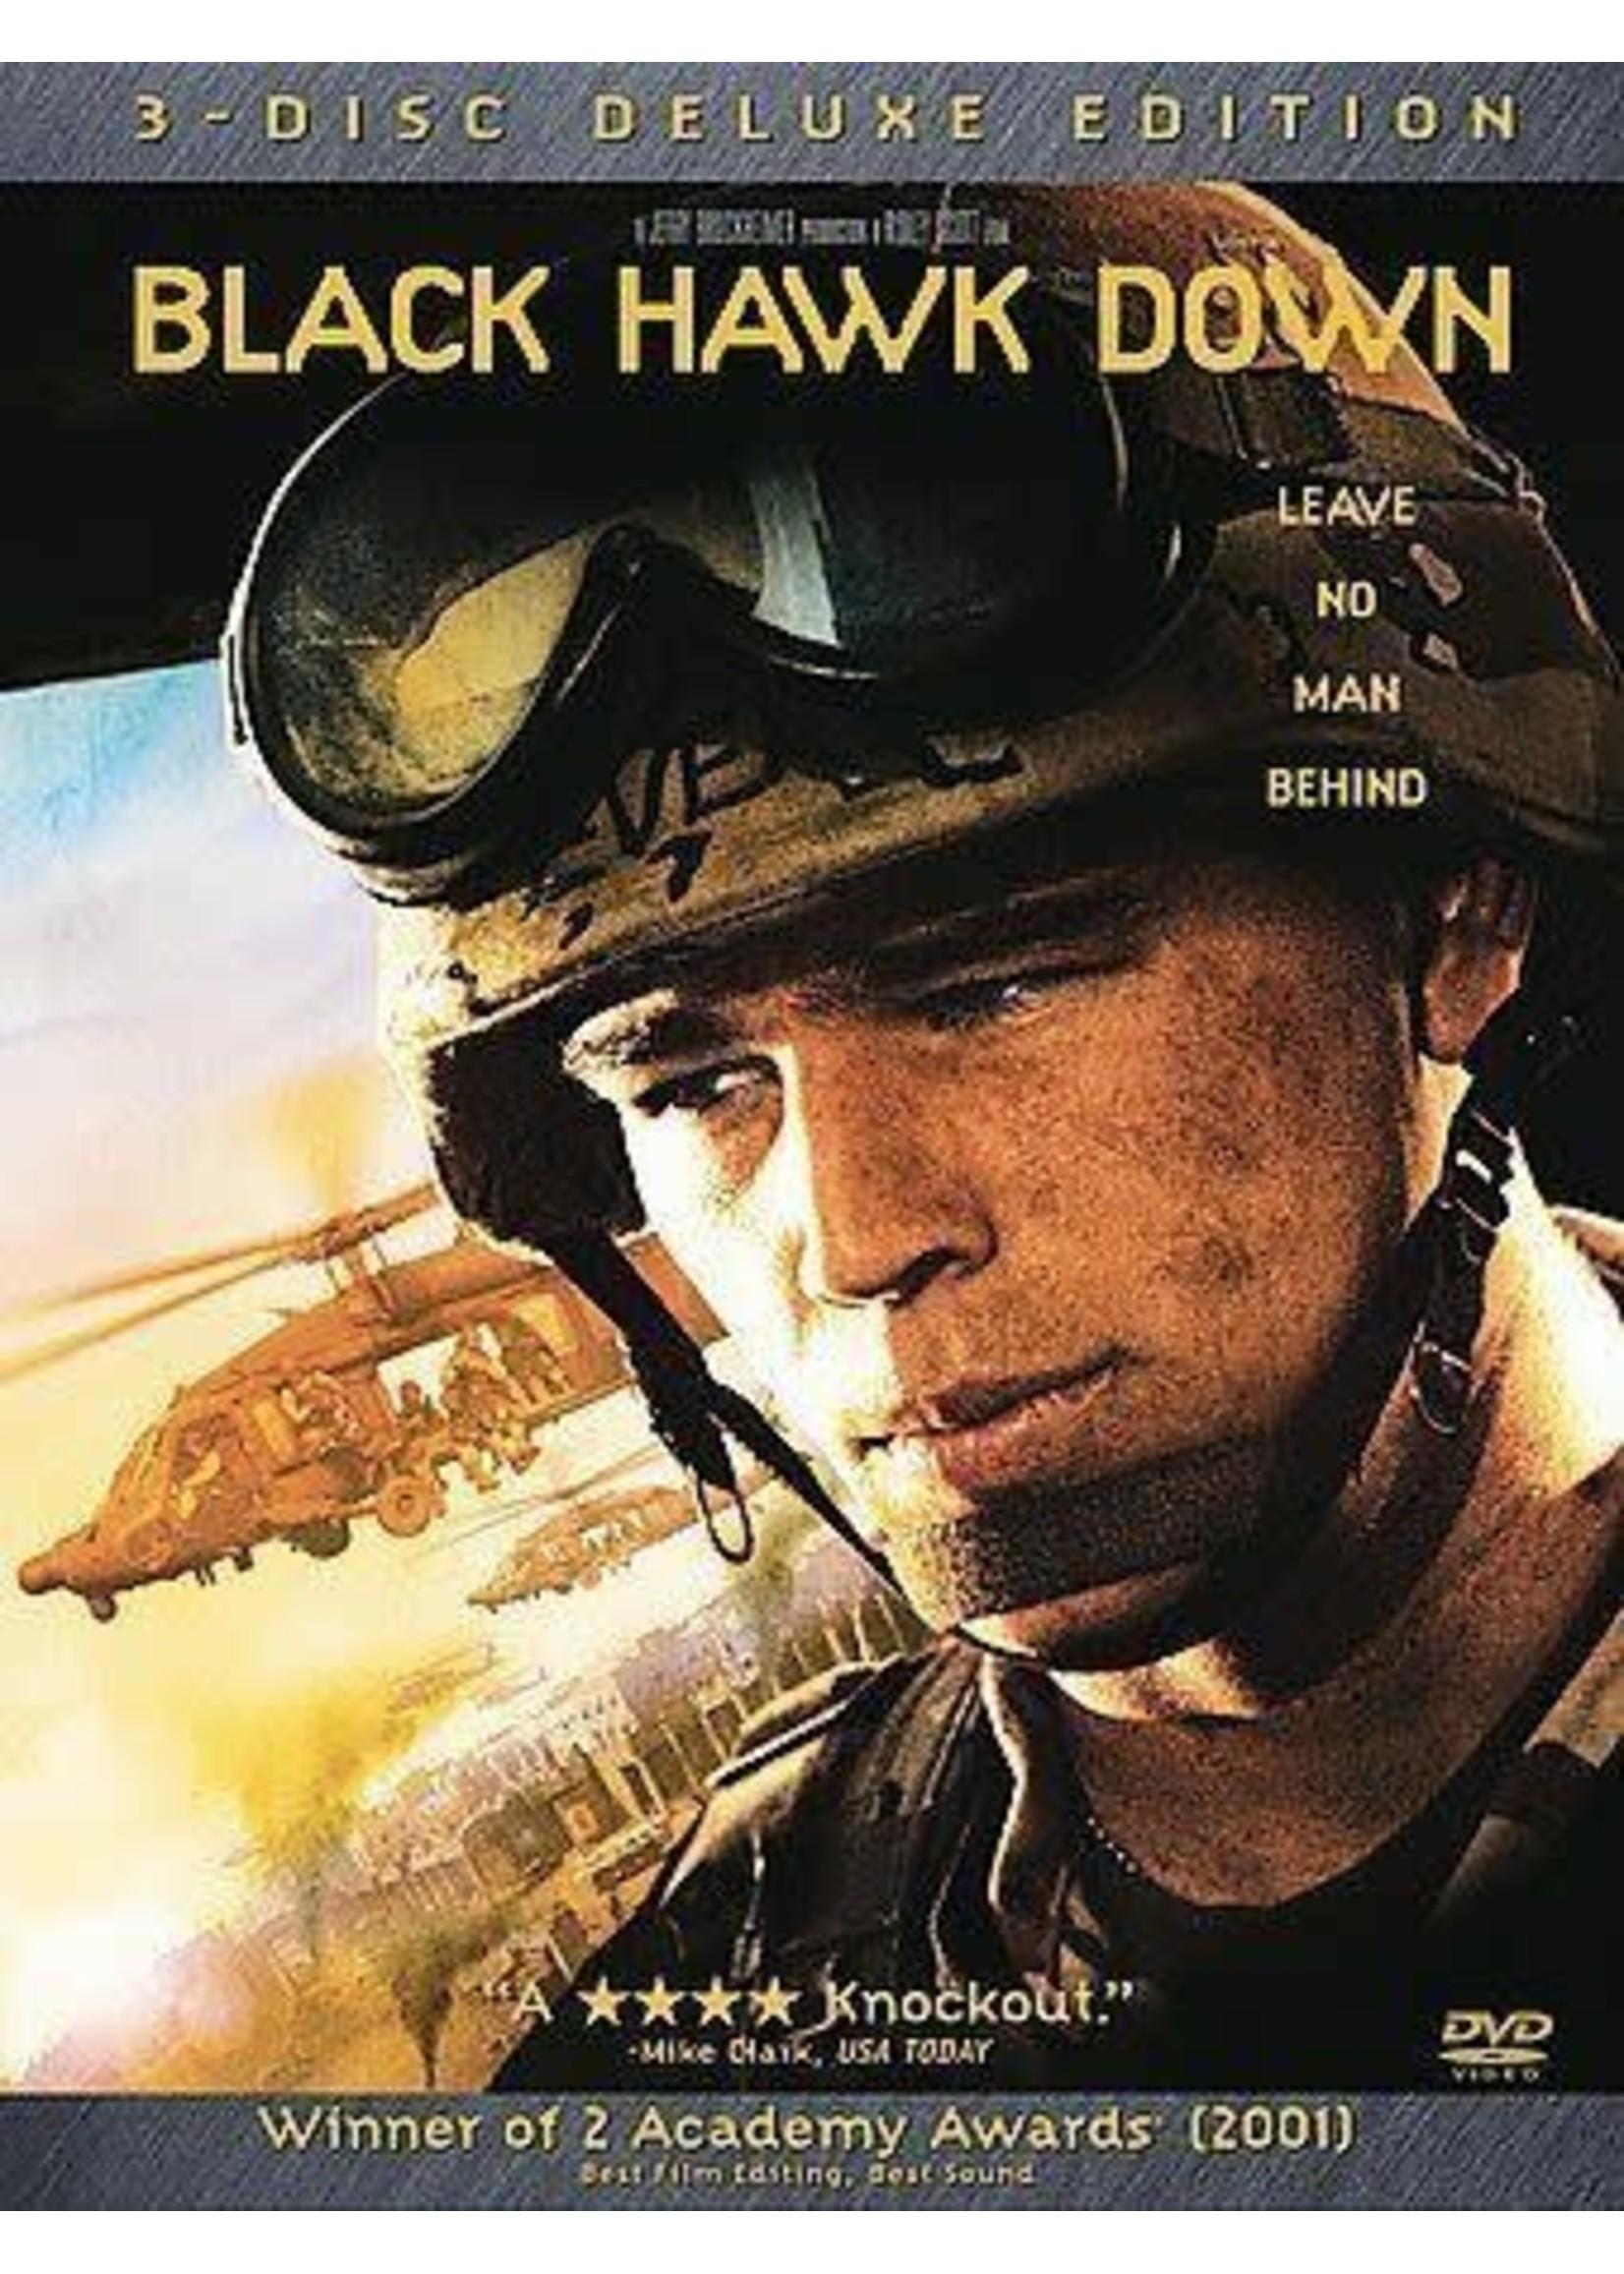 Black Hawk Down (3-Disc Deluxe Edition) DVD